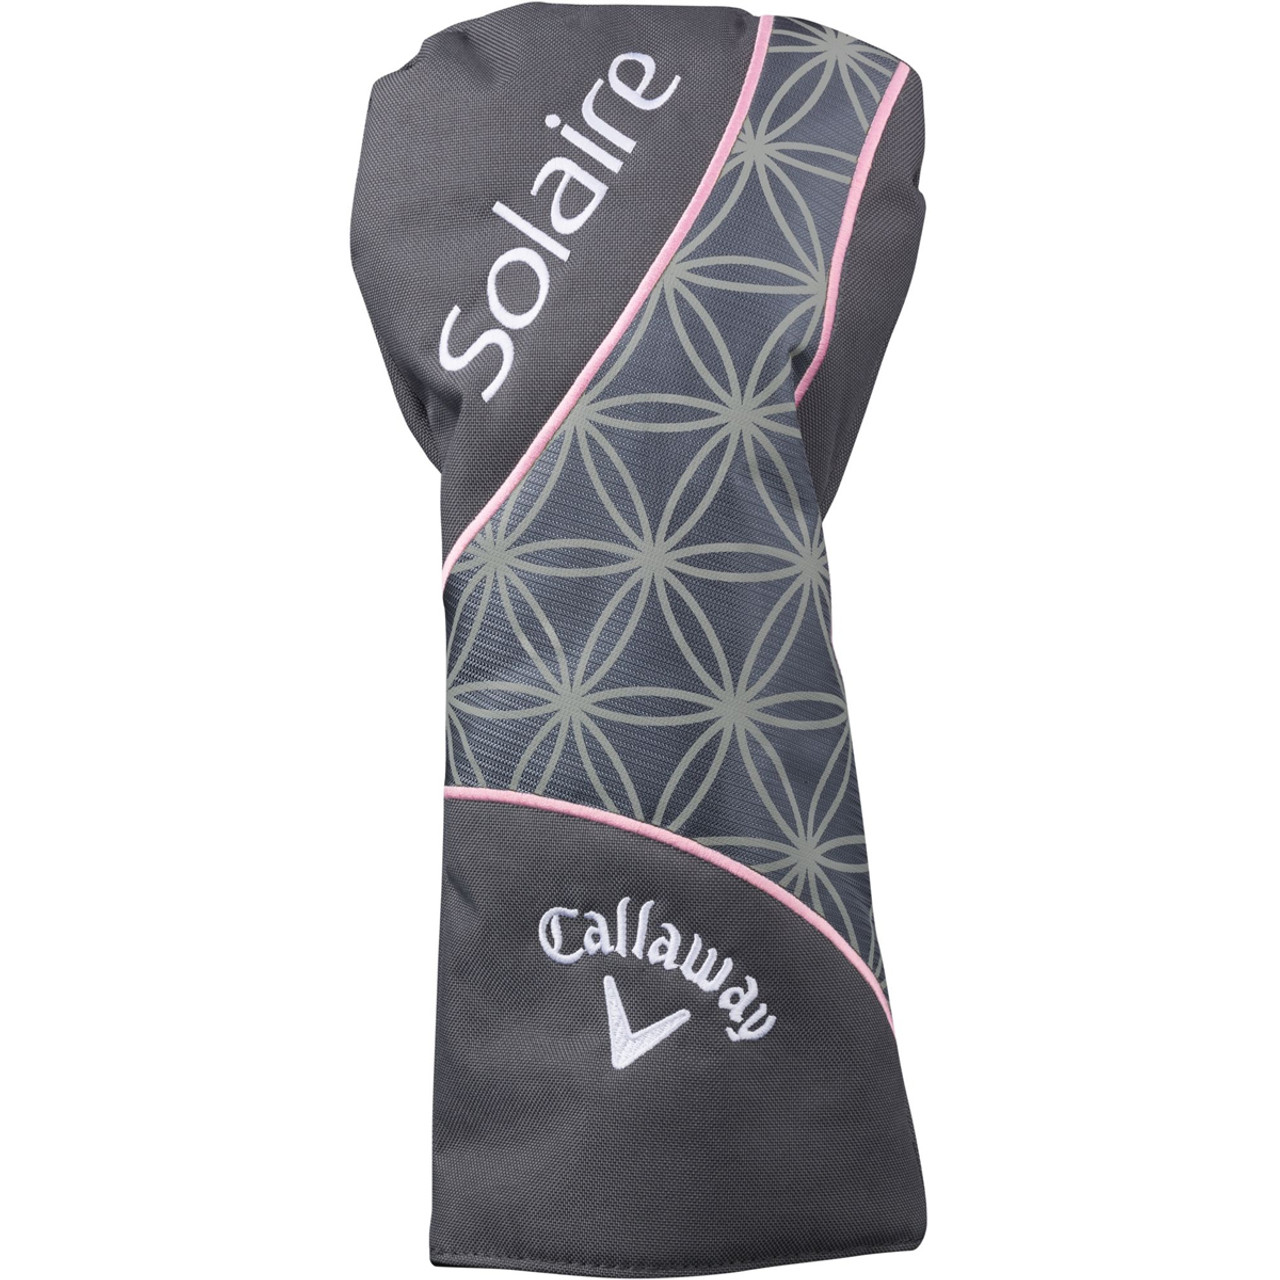 Callaway Womens Solaire 11 Piece Golf Cherry Blossom Headcover